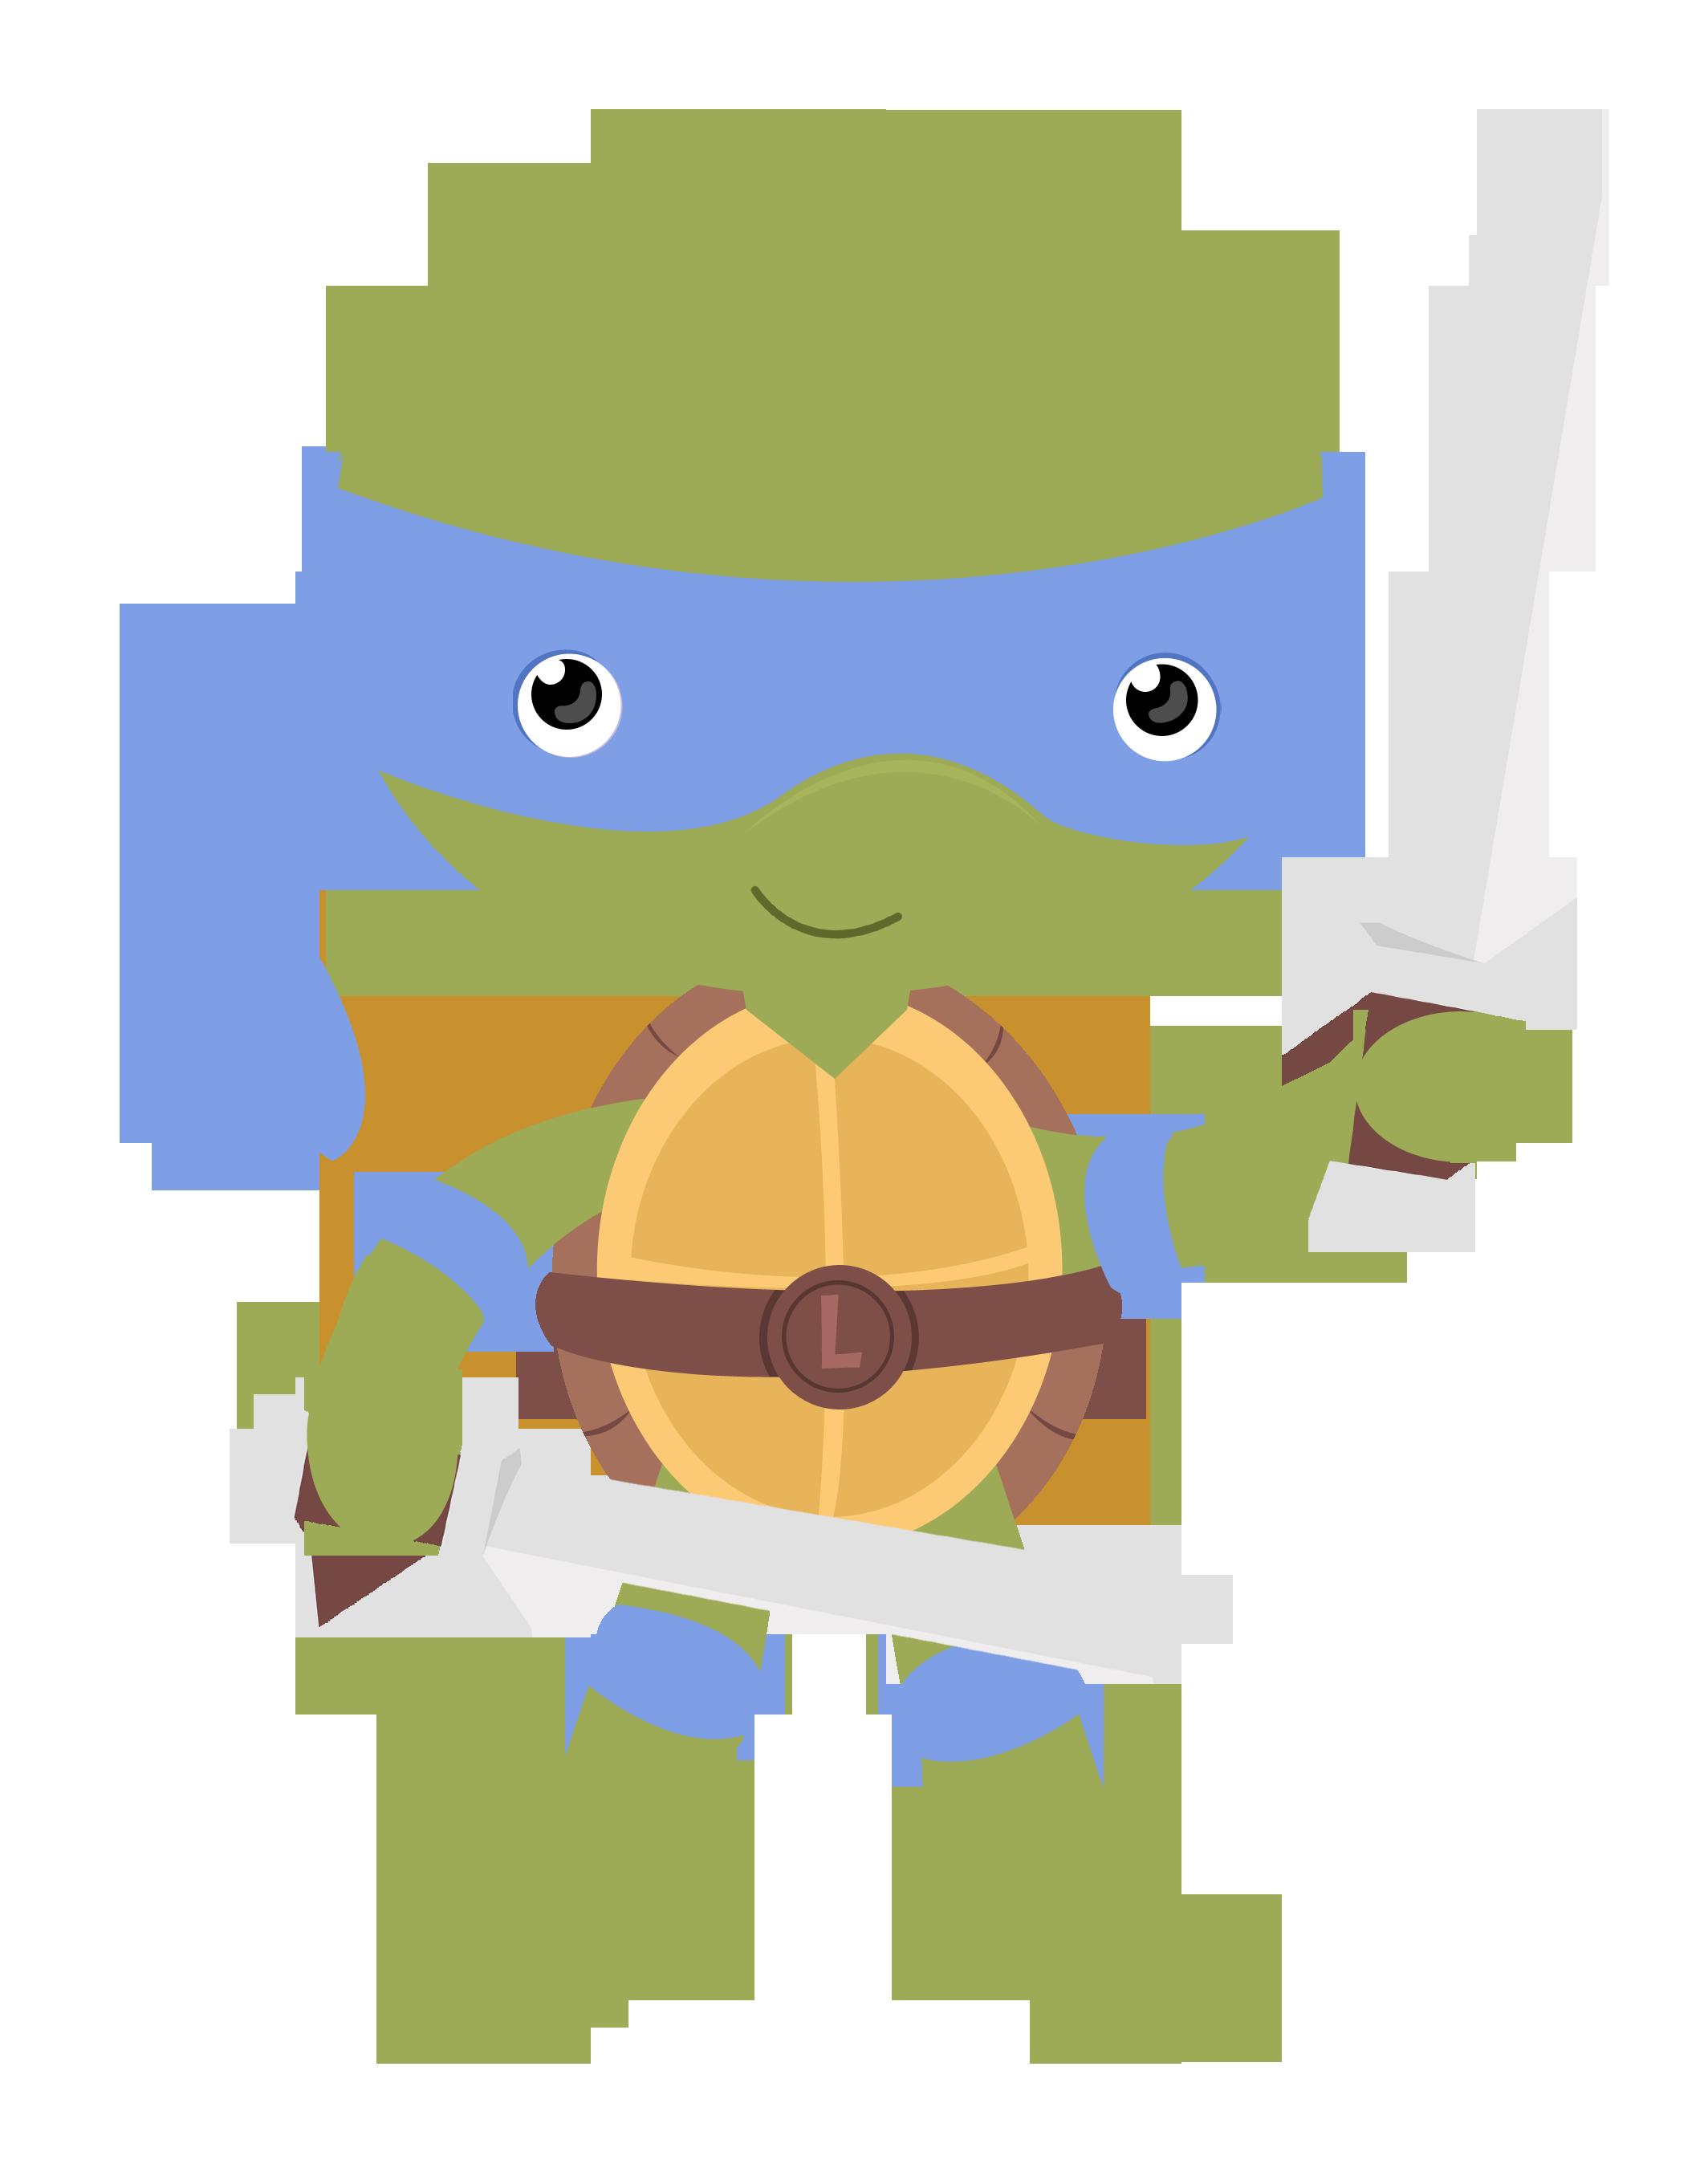 Halloween ninja mask clipart graphic royalty free library Tartarugas Ninja - CAT_Teenage Turtle 2.png - Minus | clipart ... graphic royalty free library